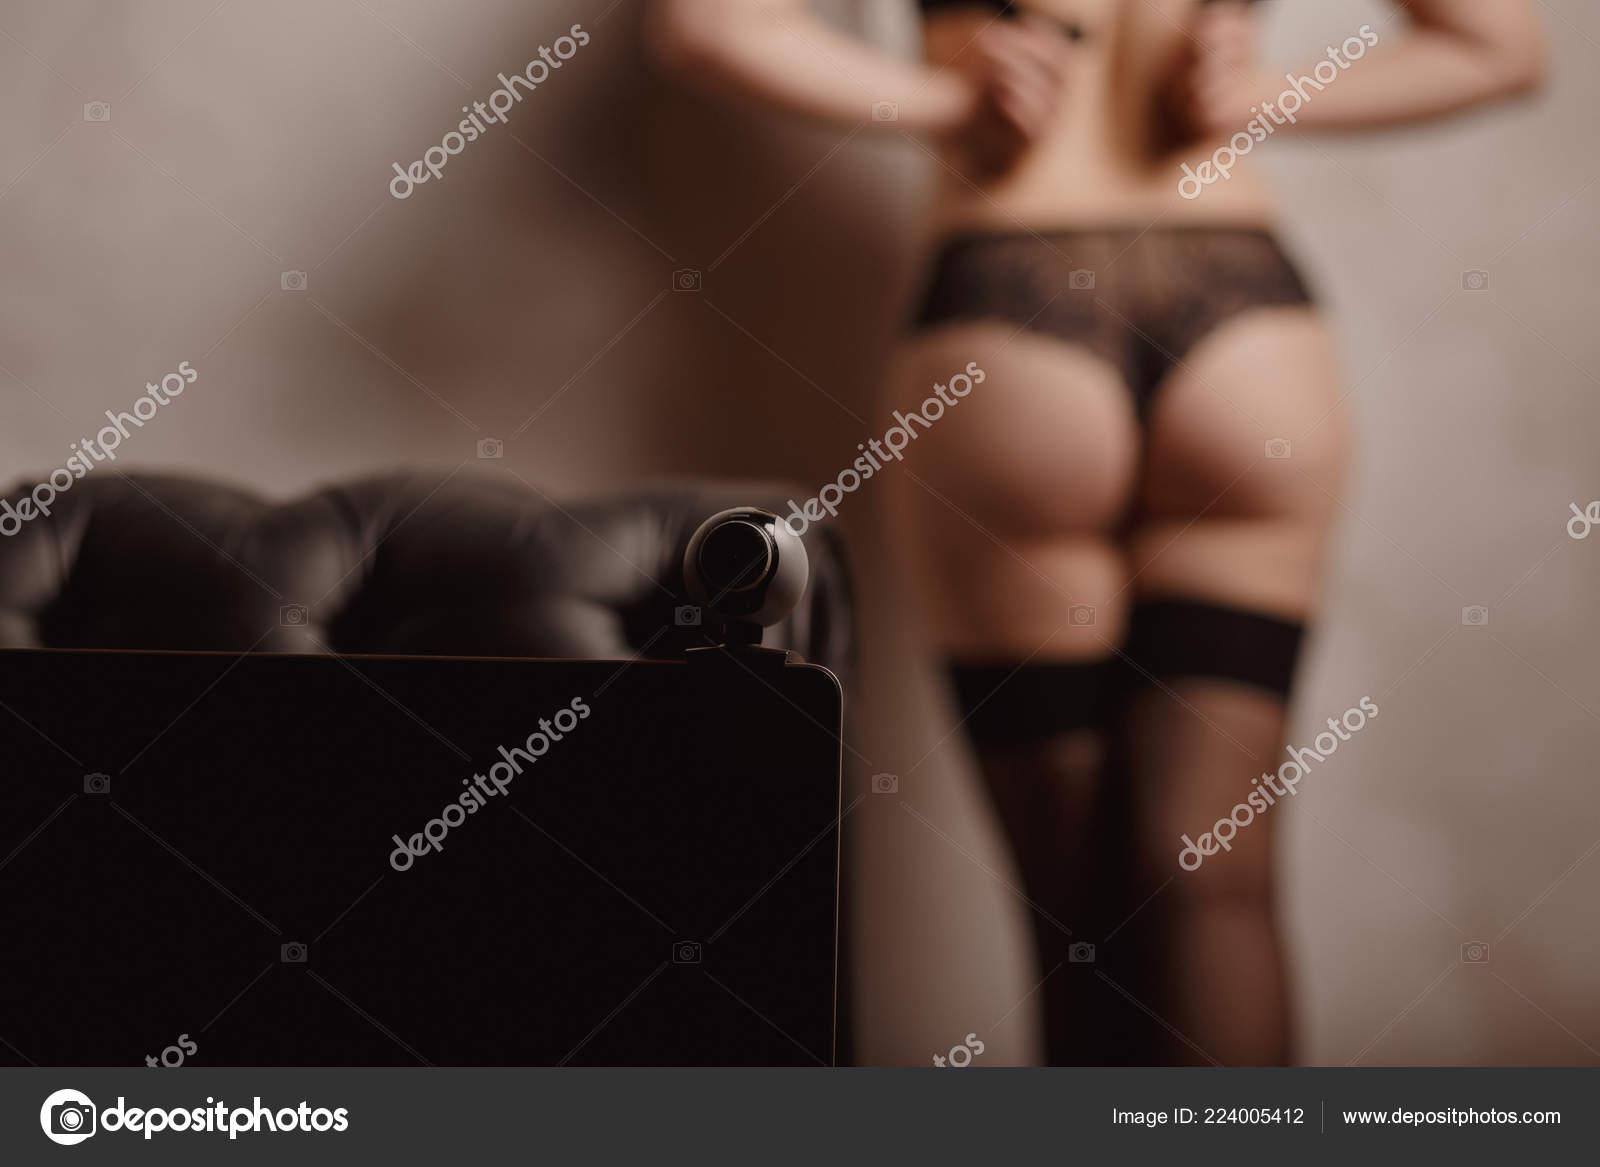 Веб камеры модели онлайн изнасилование девушки на работе видео